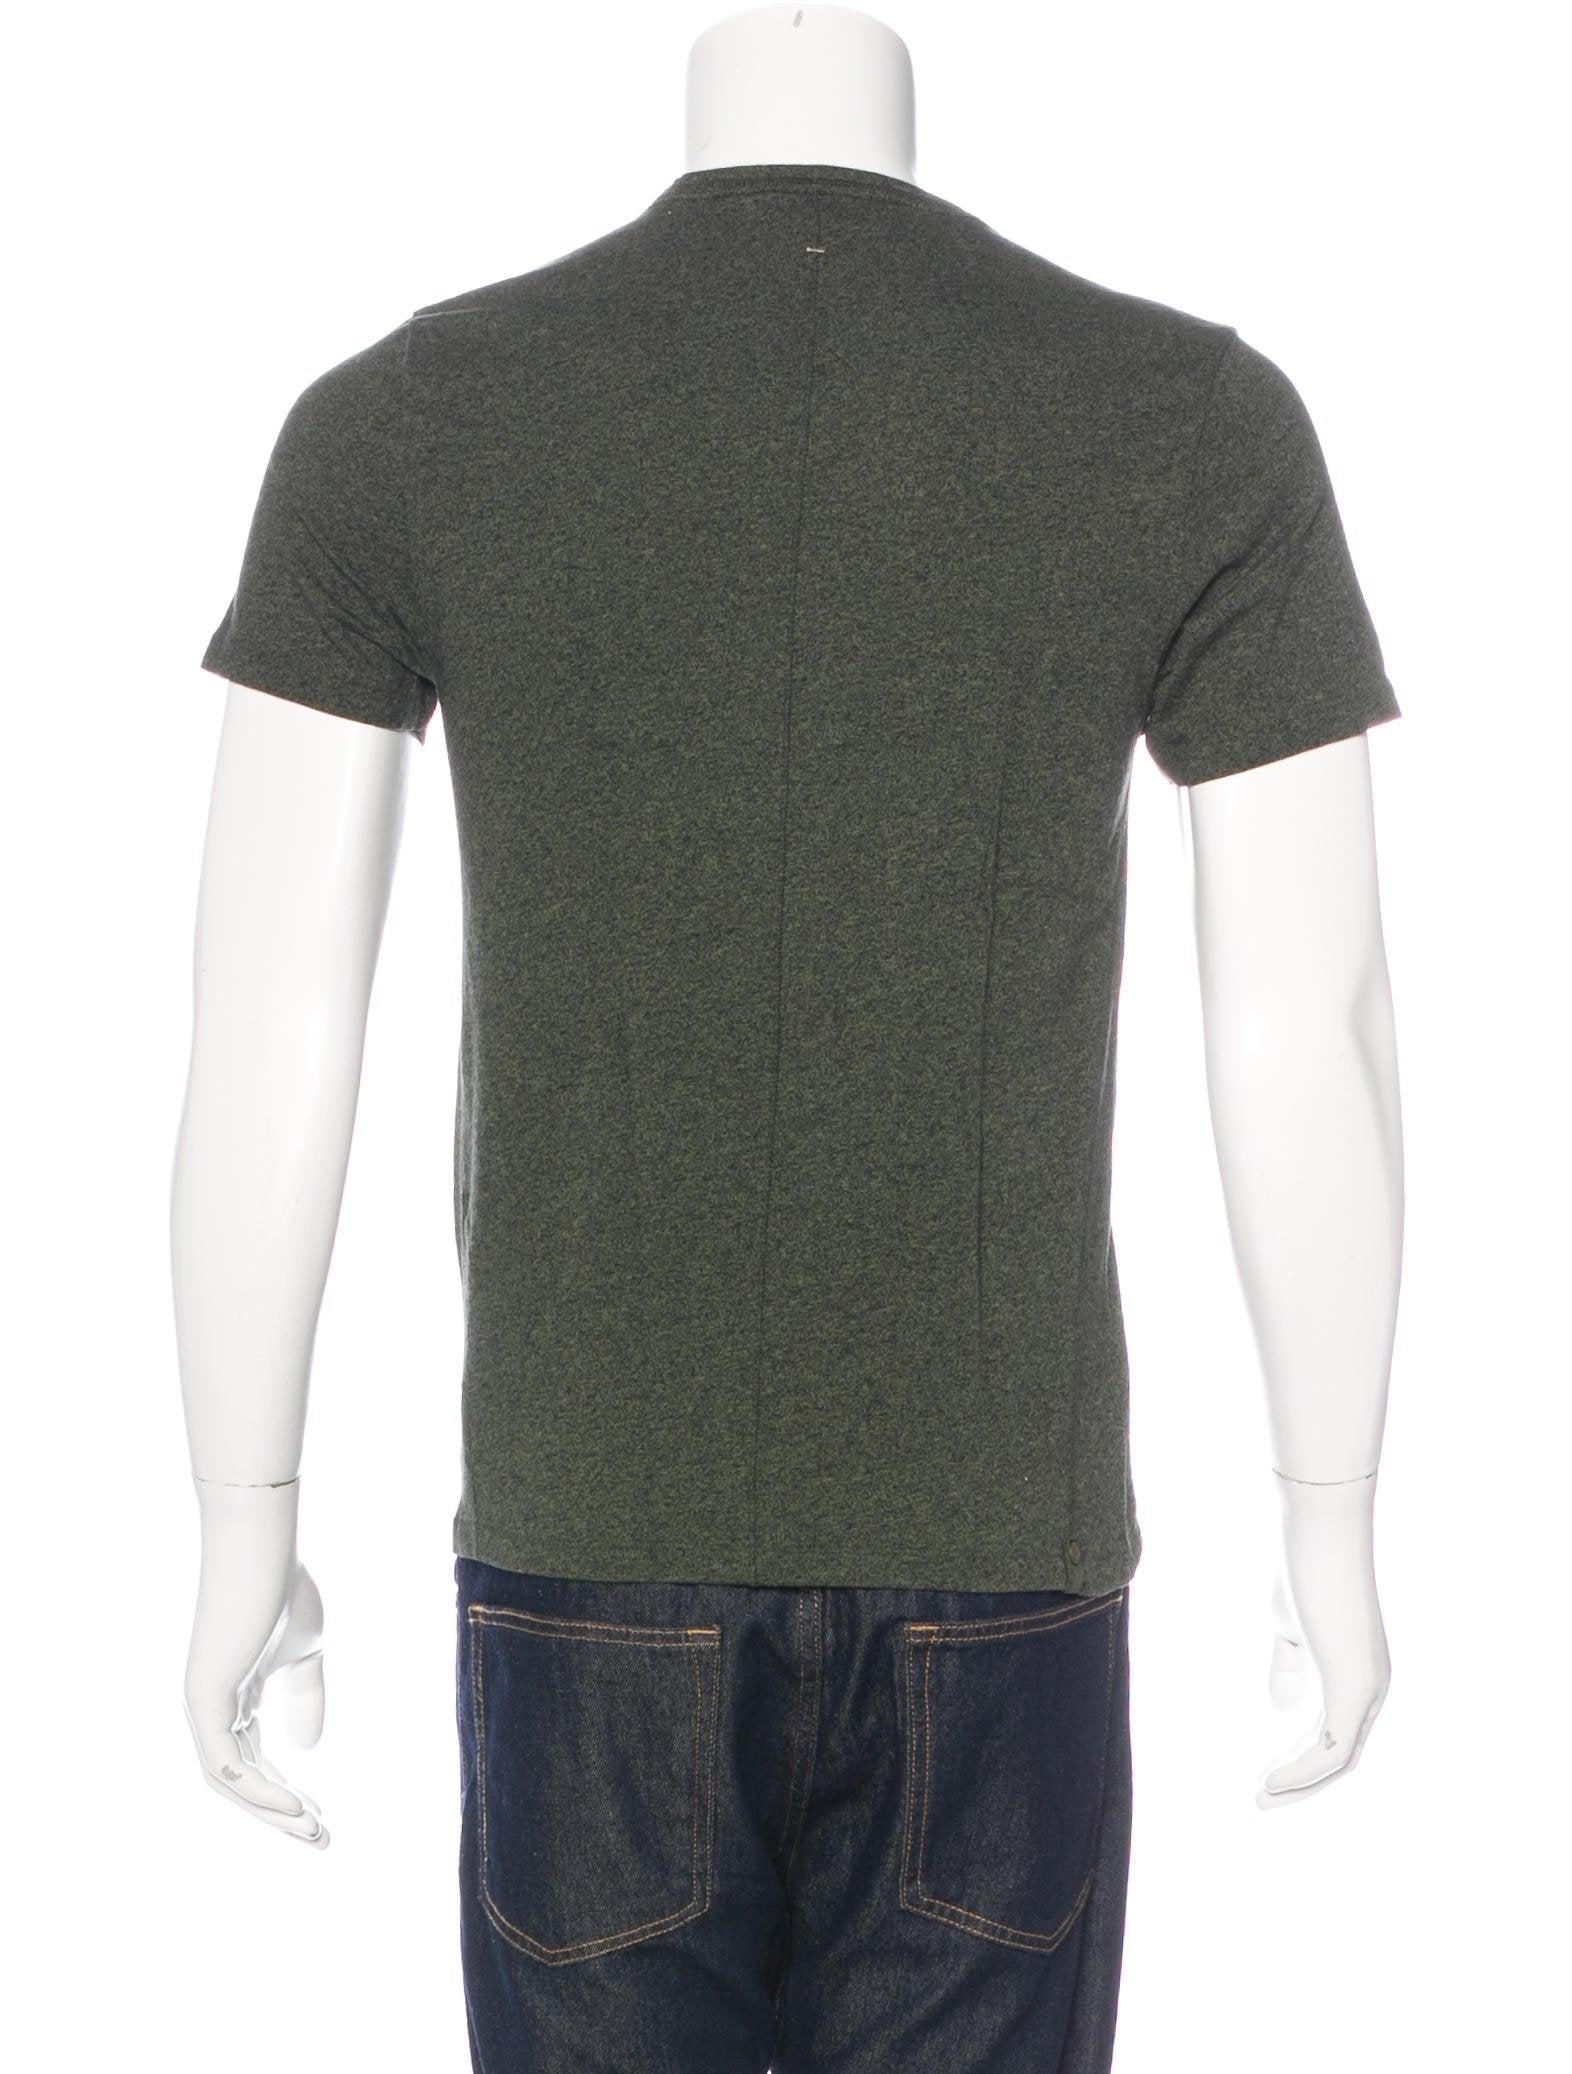 Rag bone crew neck t shirt clothing wragb71237 the for Rag and bone t shirts